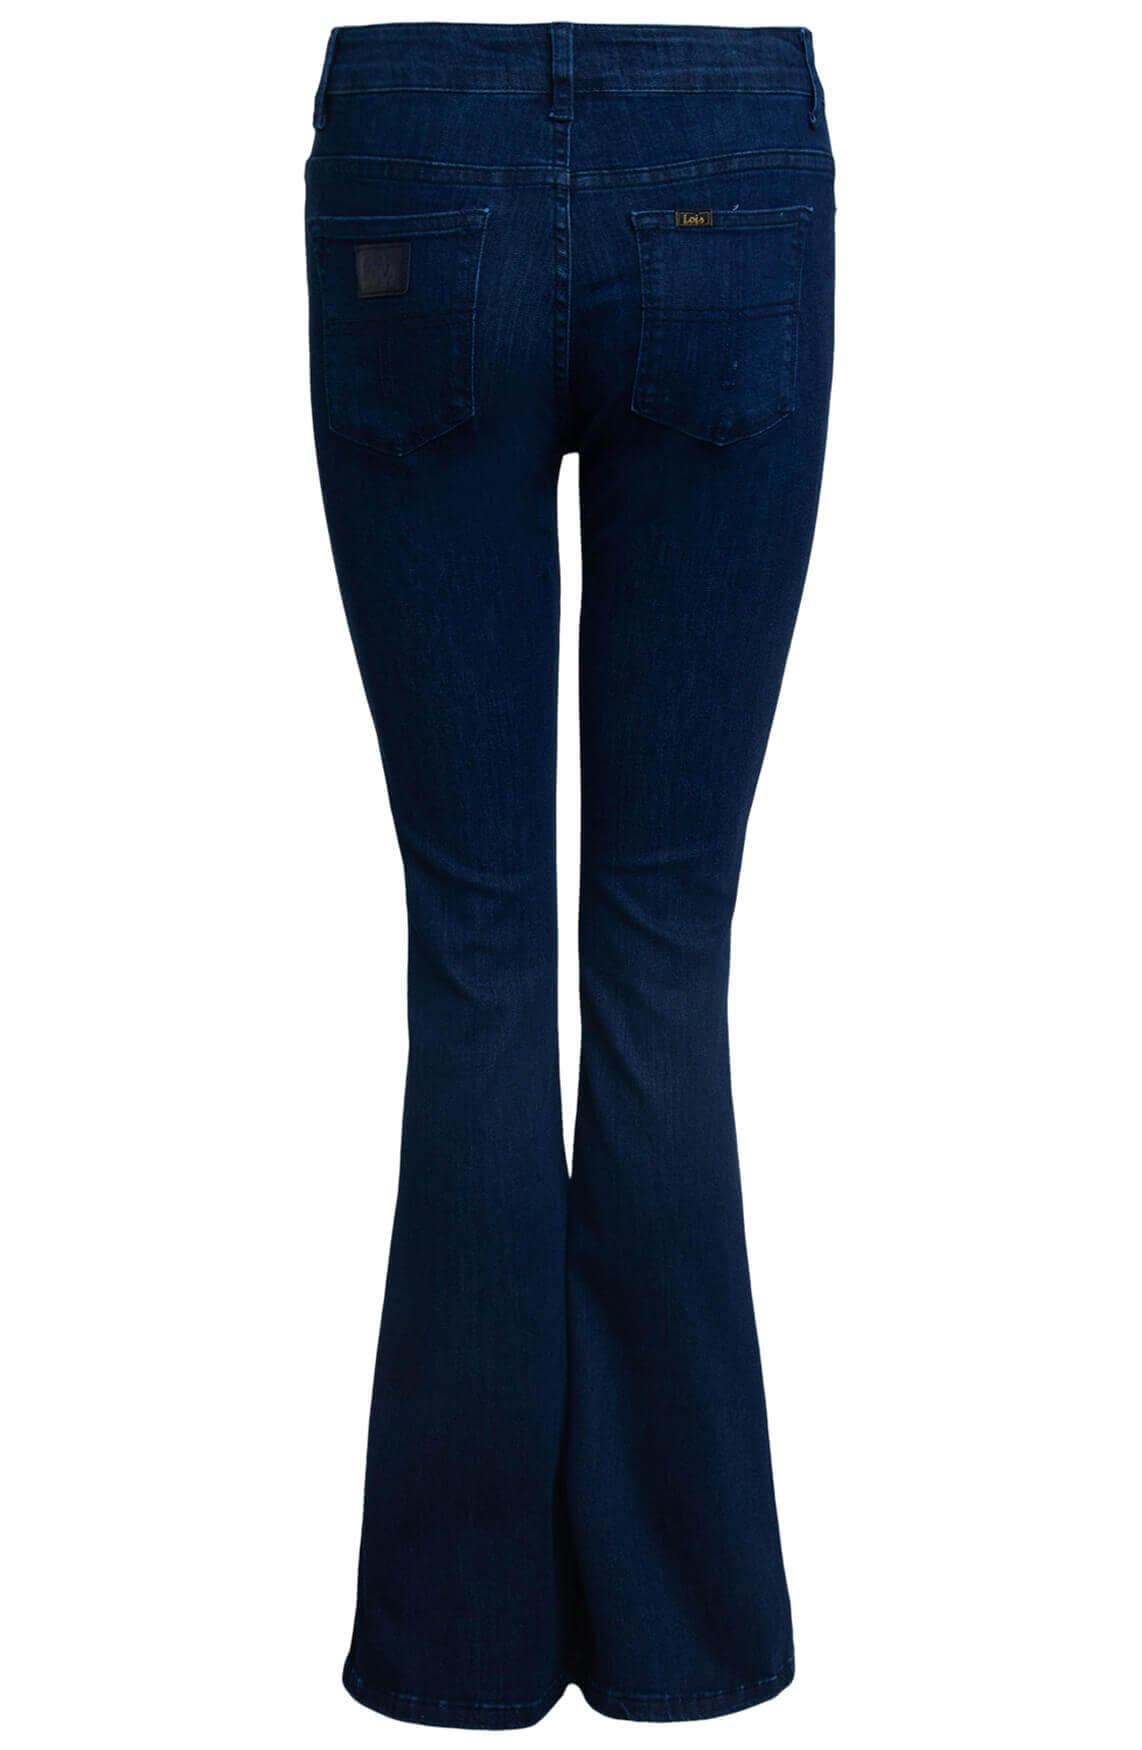 Lois Dames L32 Raval Leia jeans Blauw